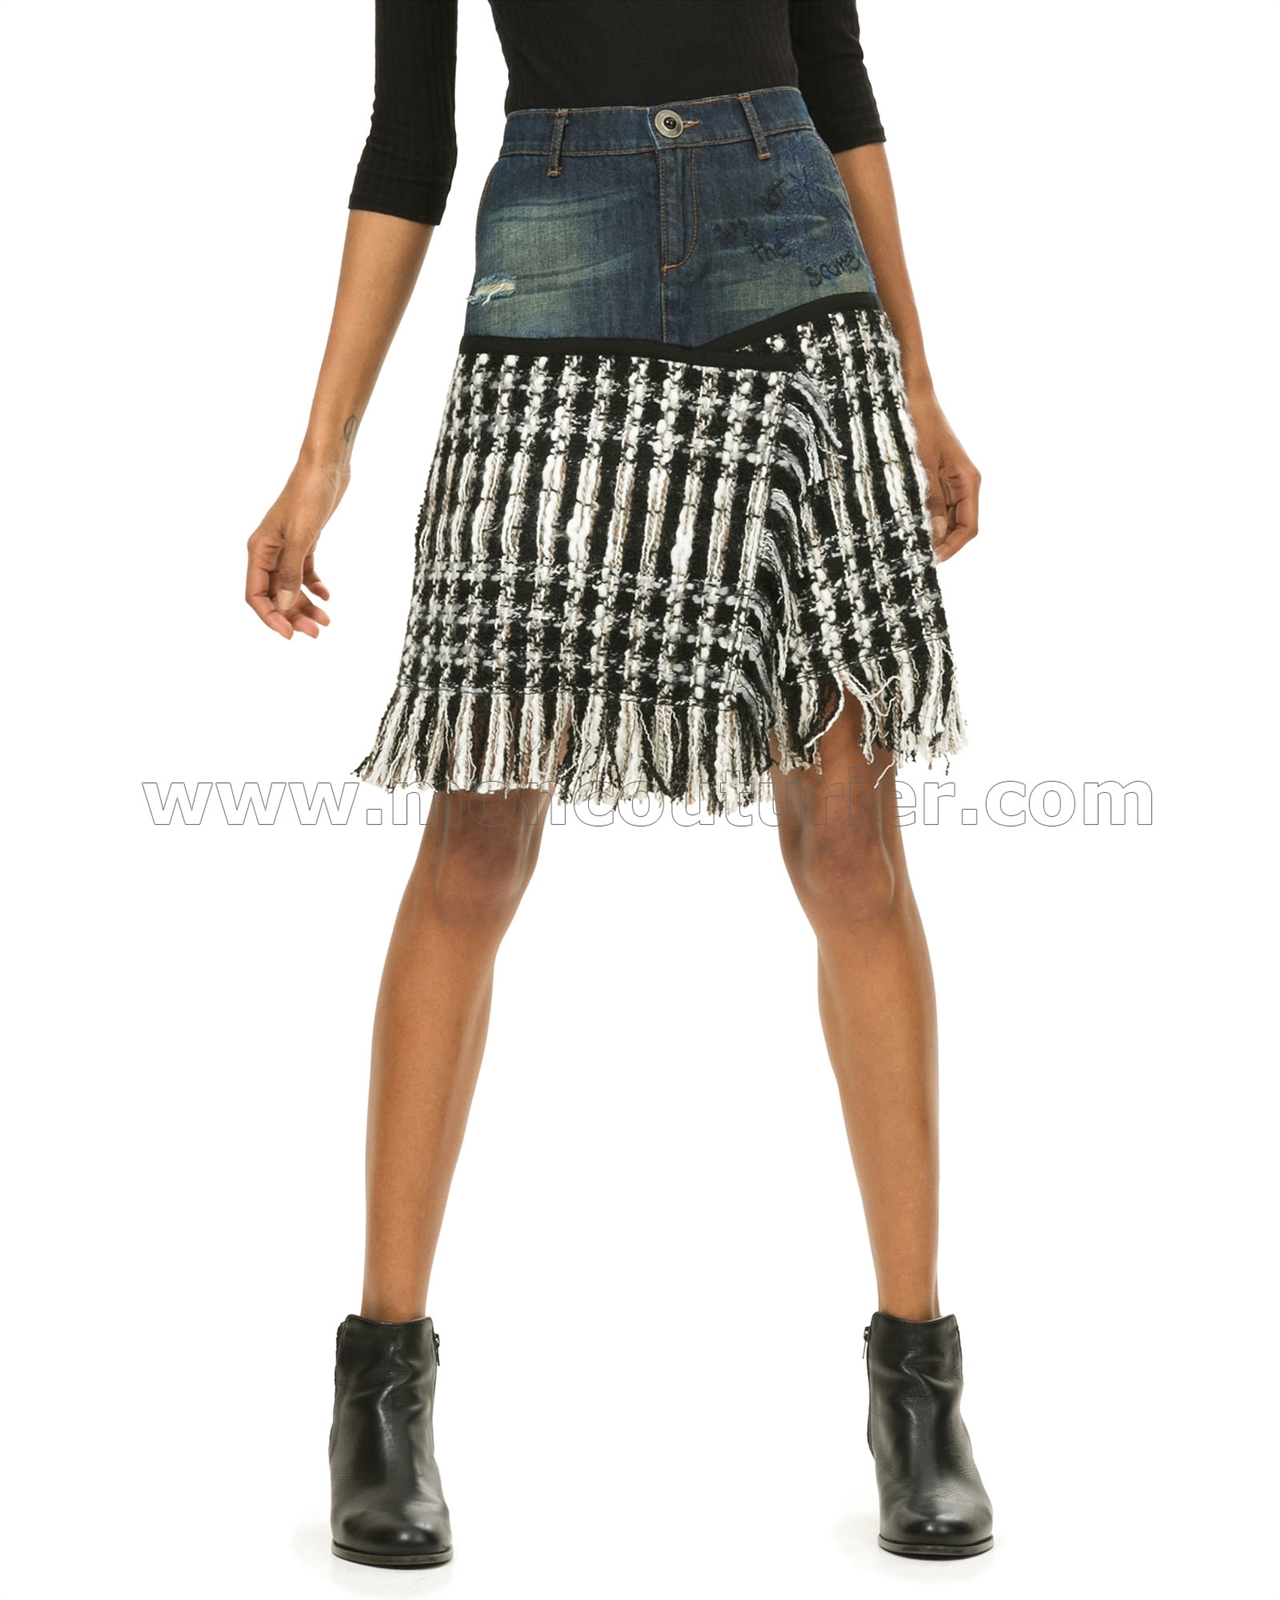 a9e6d2ccd5045 Desigual Womens  Skirt Celia Larger Photo Email A Friend